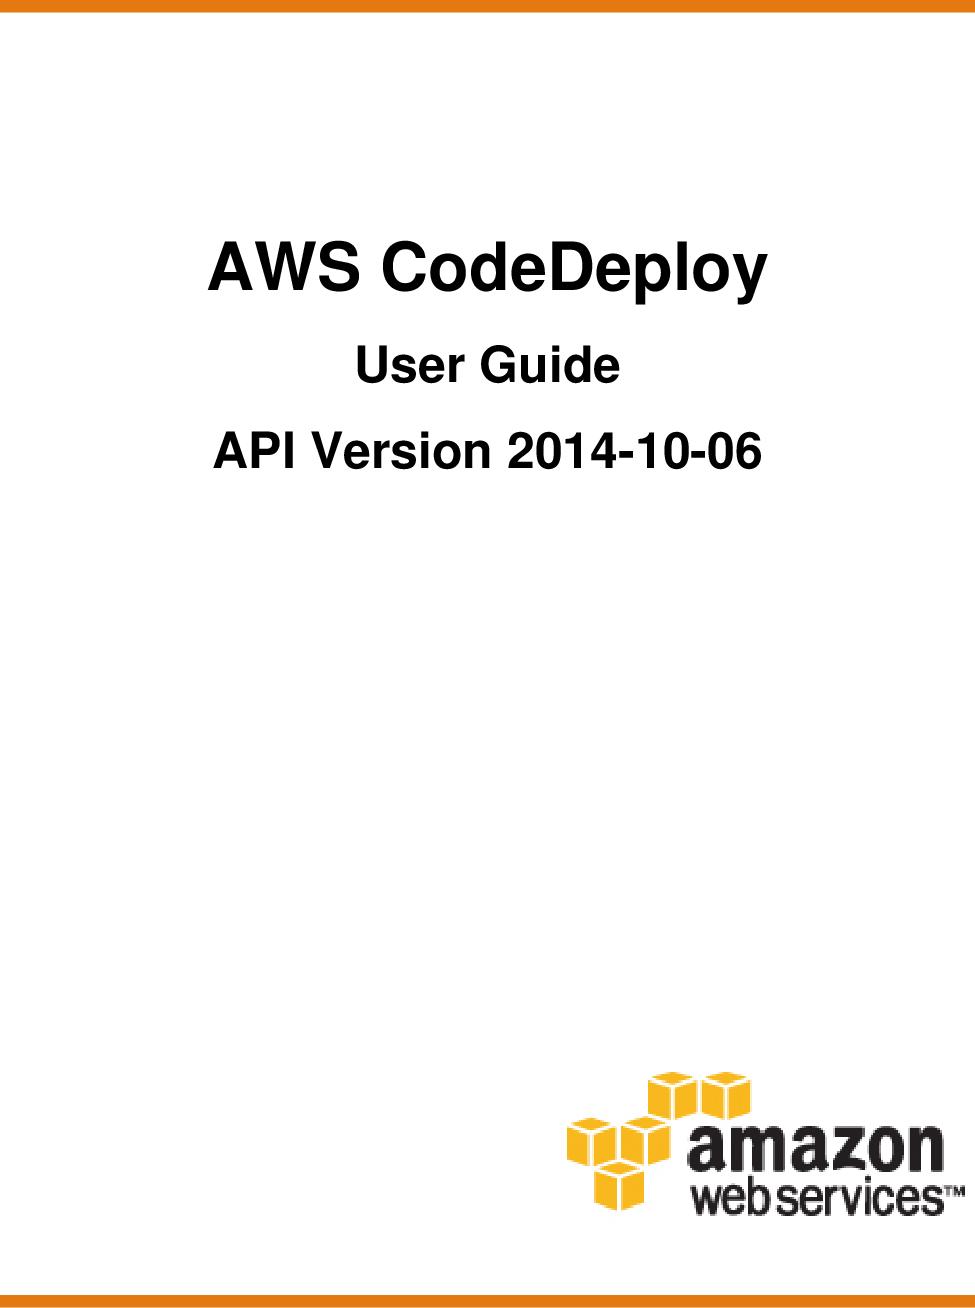 AWS CodeDeploy User Guide Code Deploy